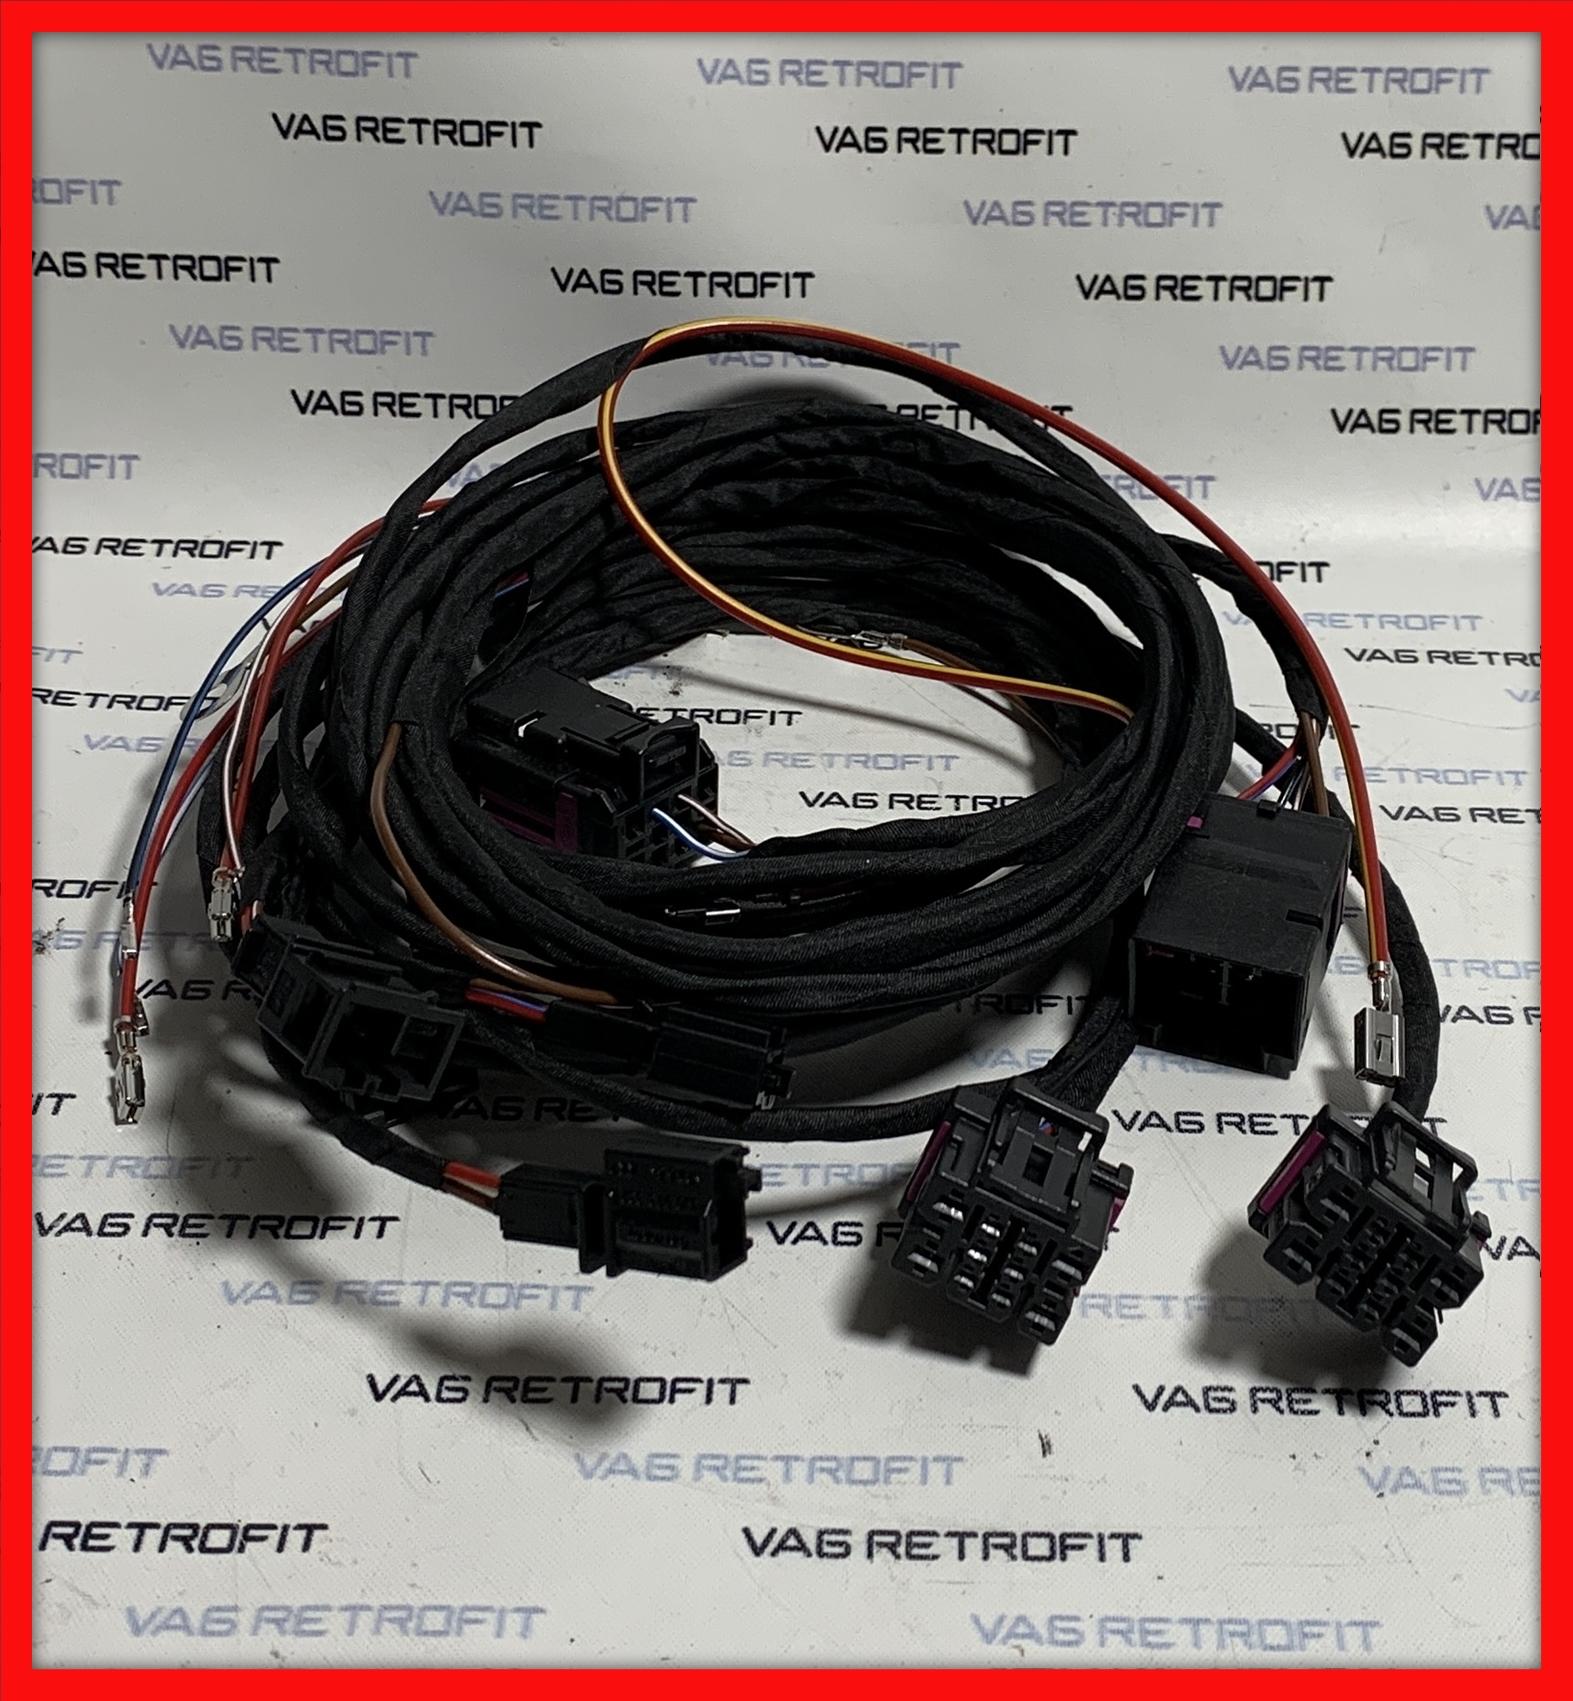 Poza - Cablu / Cablaj Scaune Incalzite VW Passat B8 3G Golf 7 VII SEAT SKODA AUDI